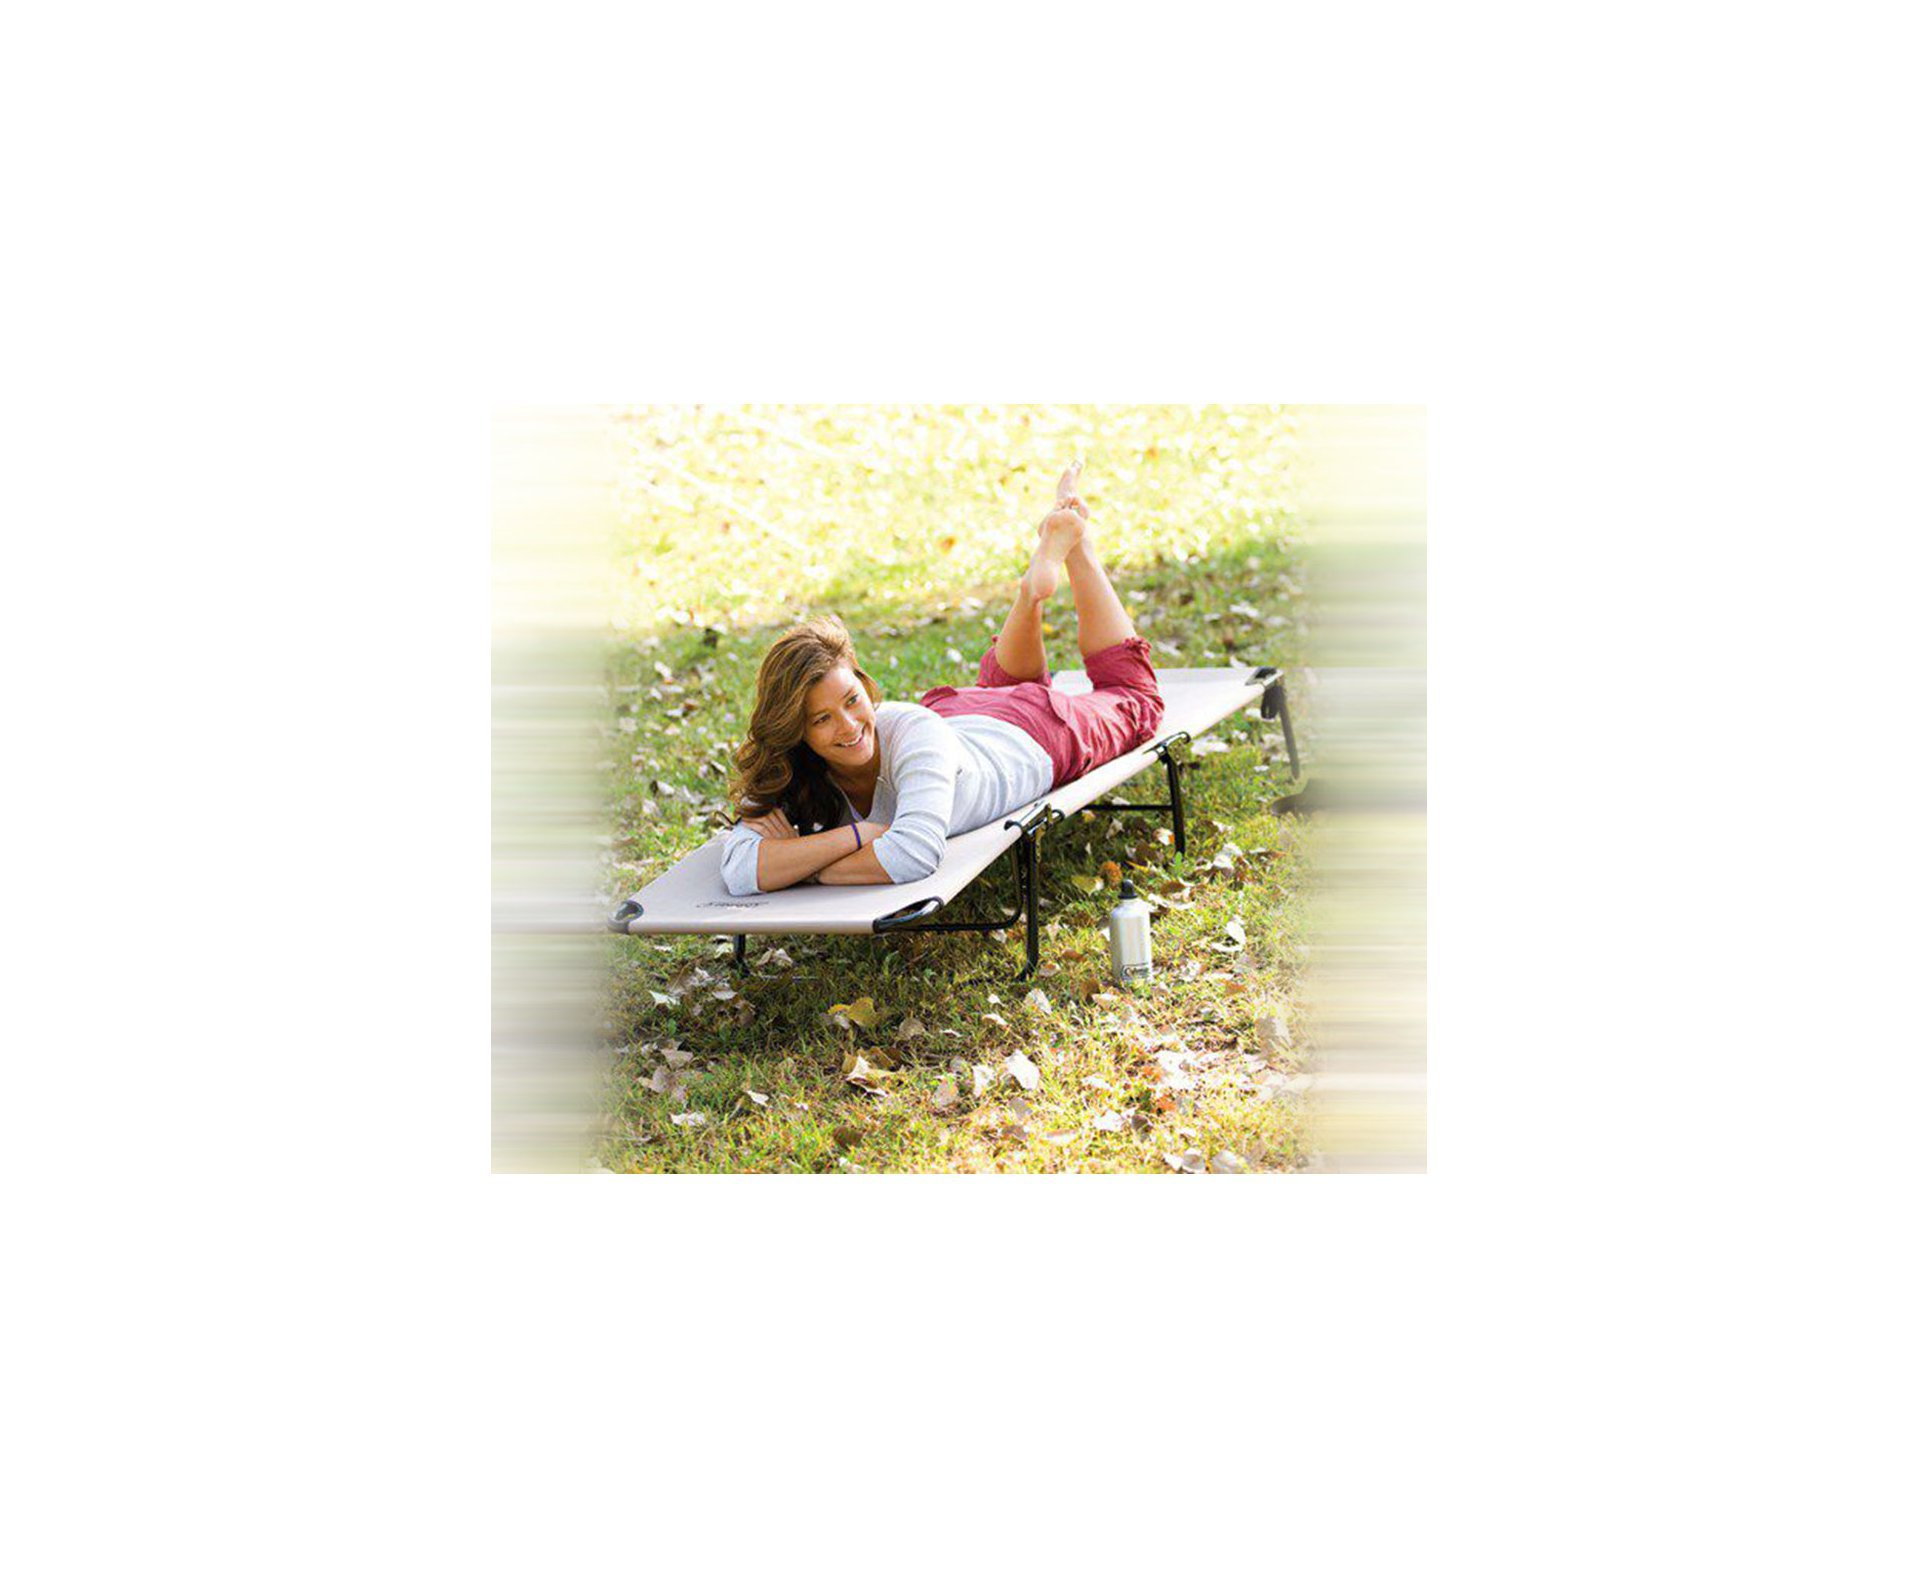 Cama Dobravel Camping Converta - Coleman